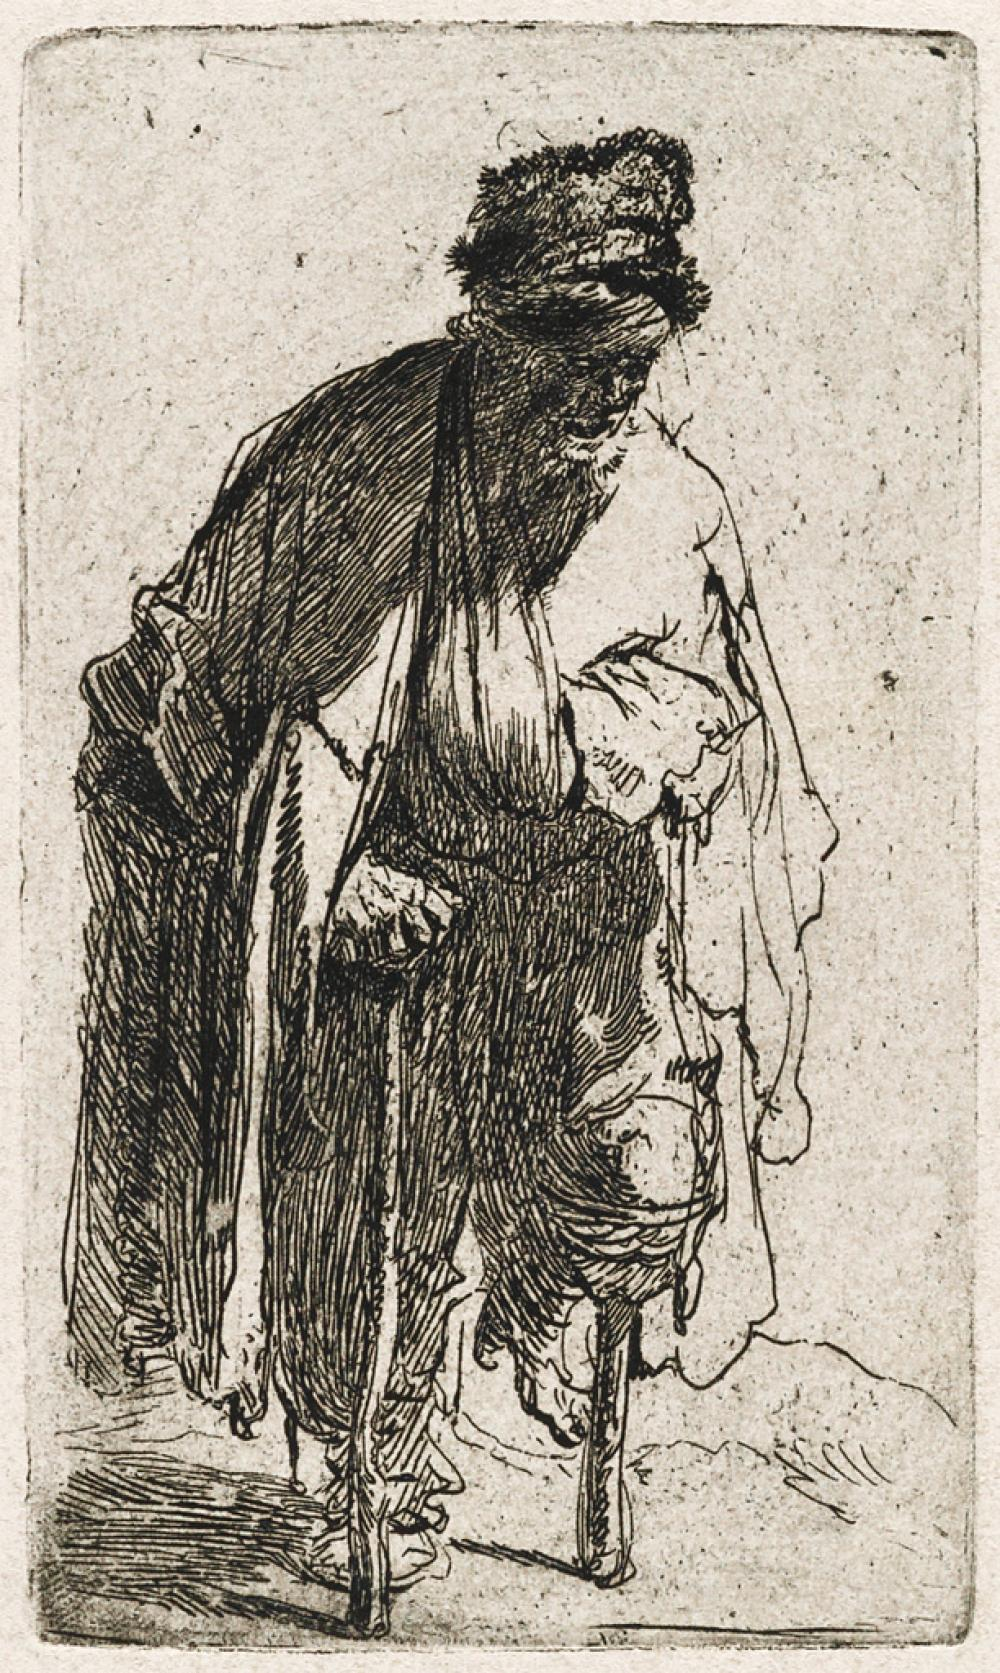 REMBRANDT VAN RIJN Beggar with a Wooden Leg.